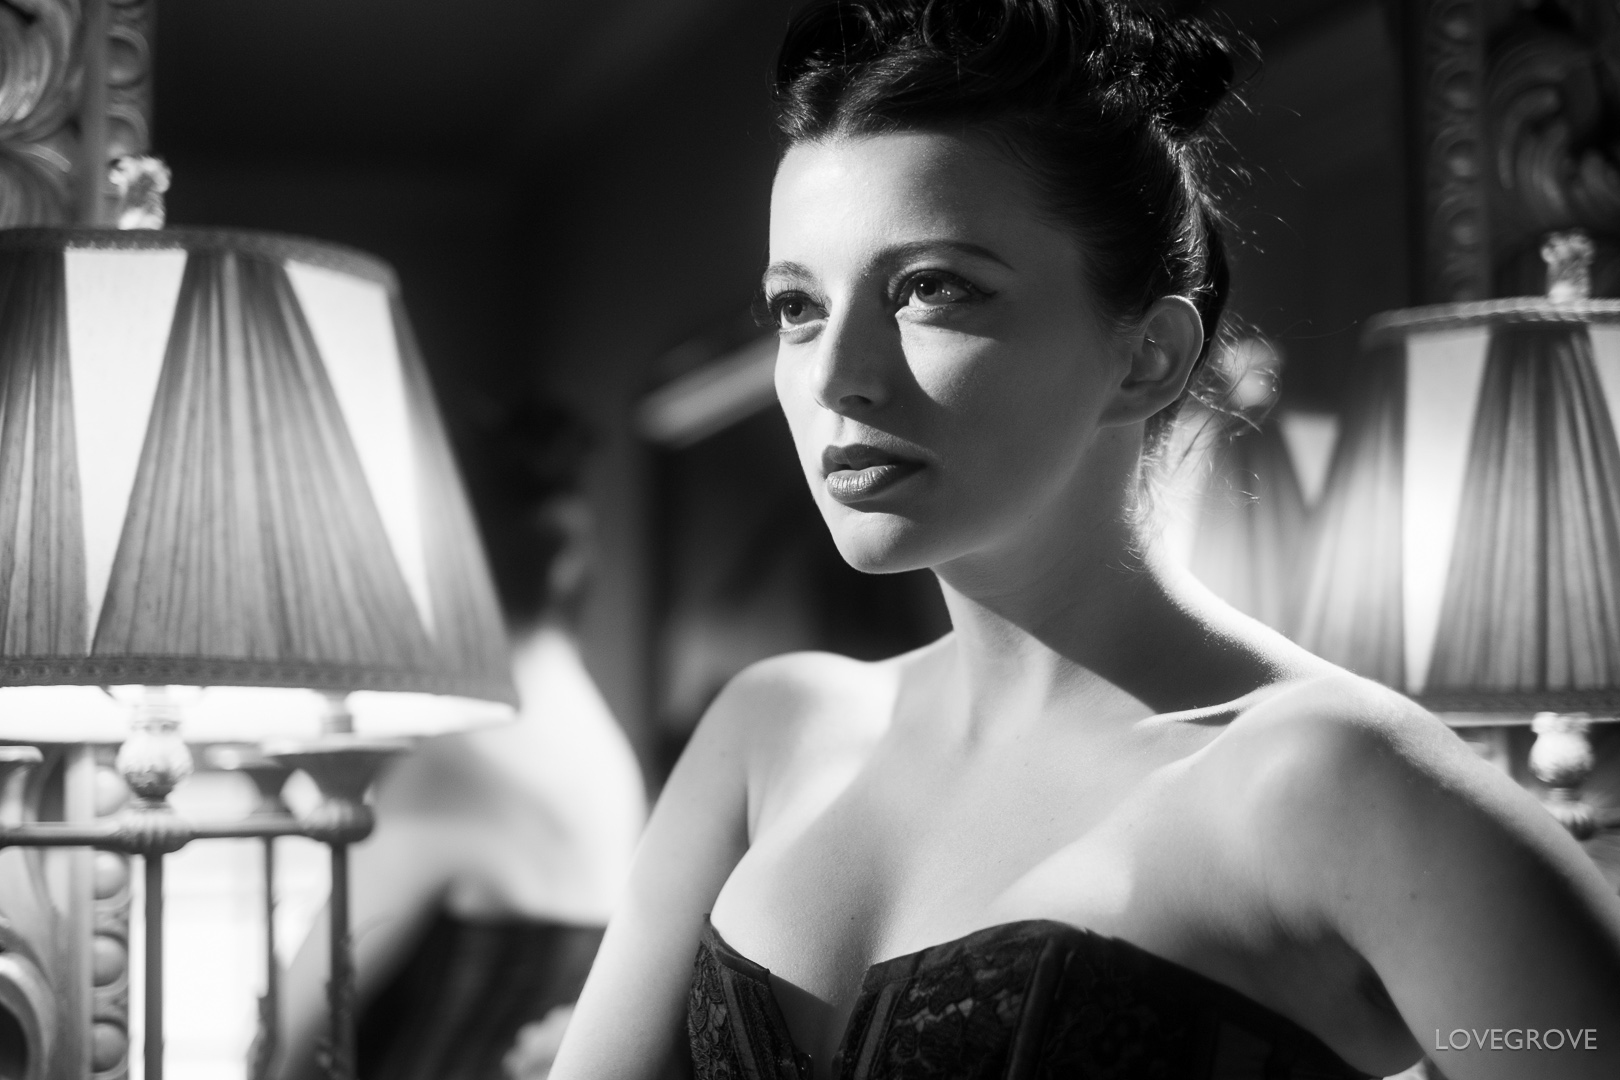 Helen Diaz in Hollywood starlet attire.